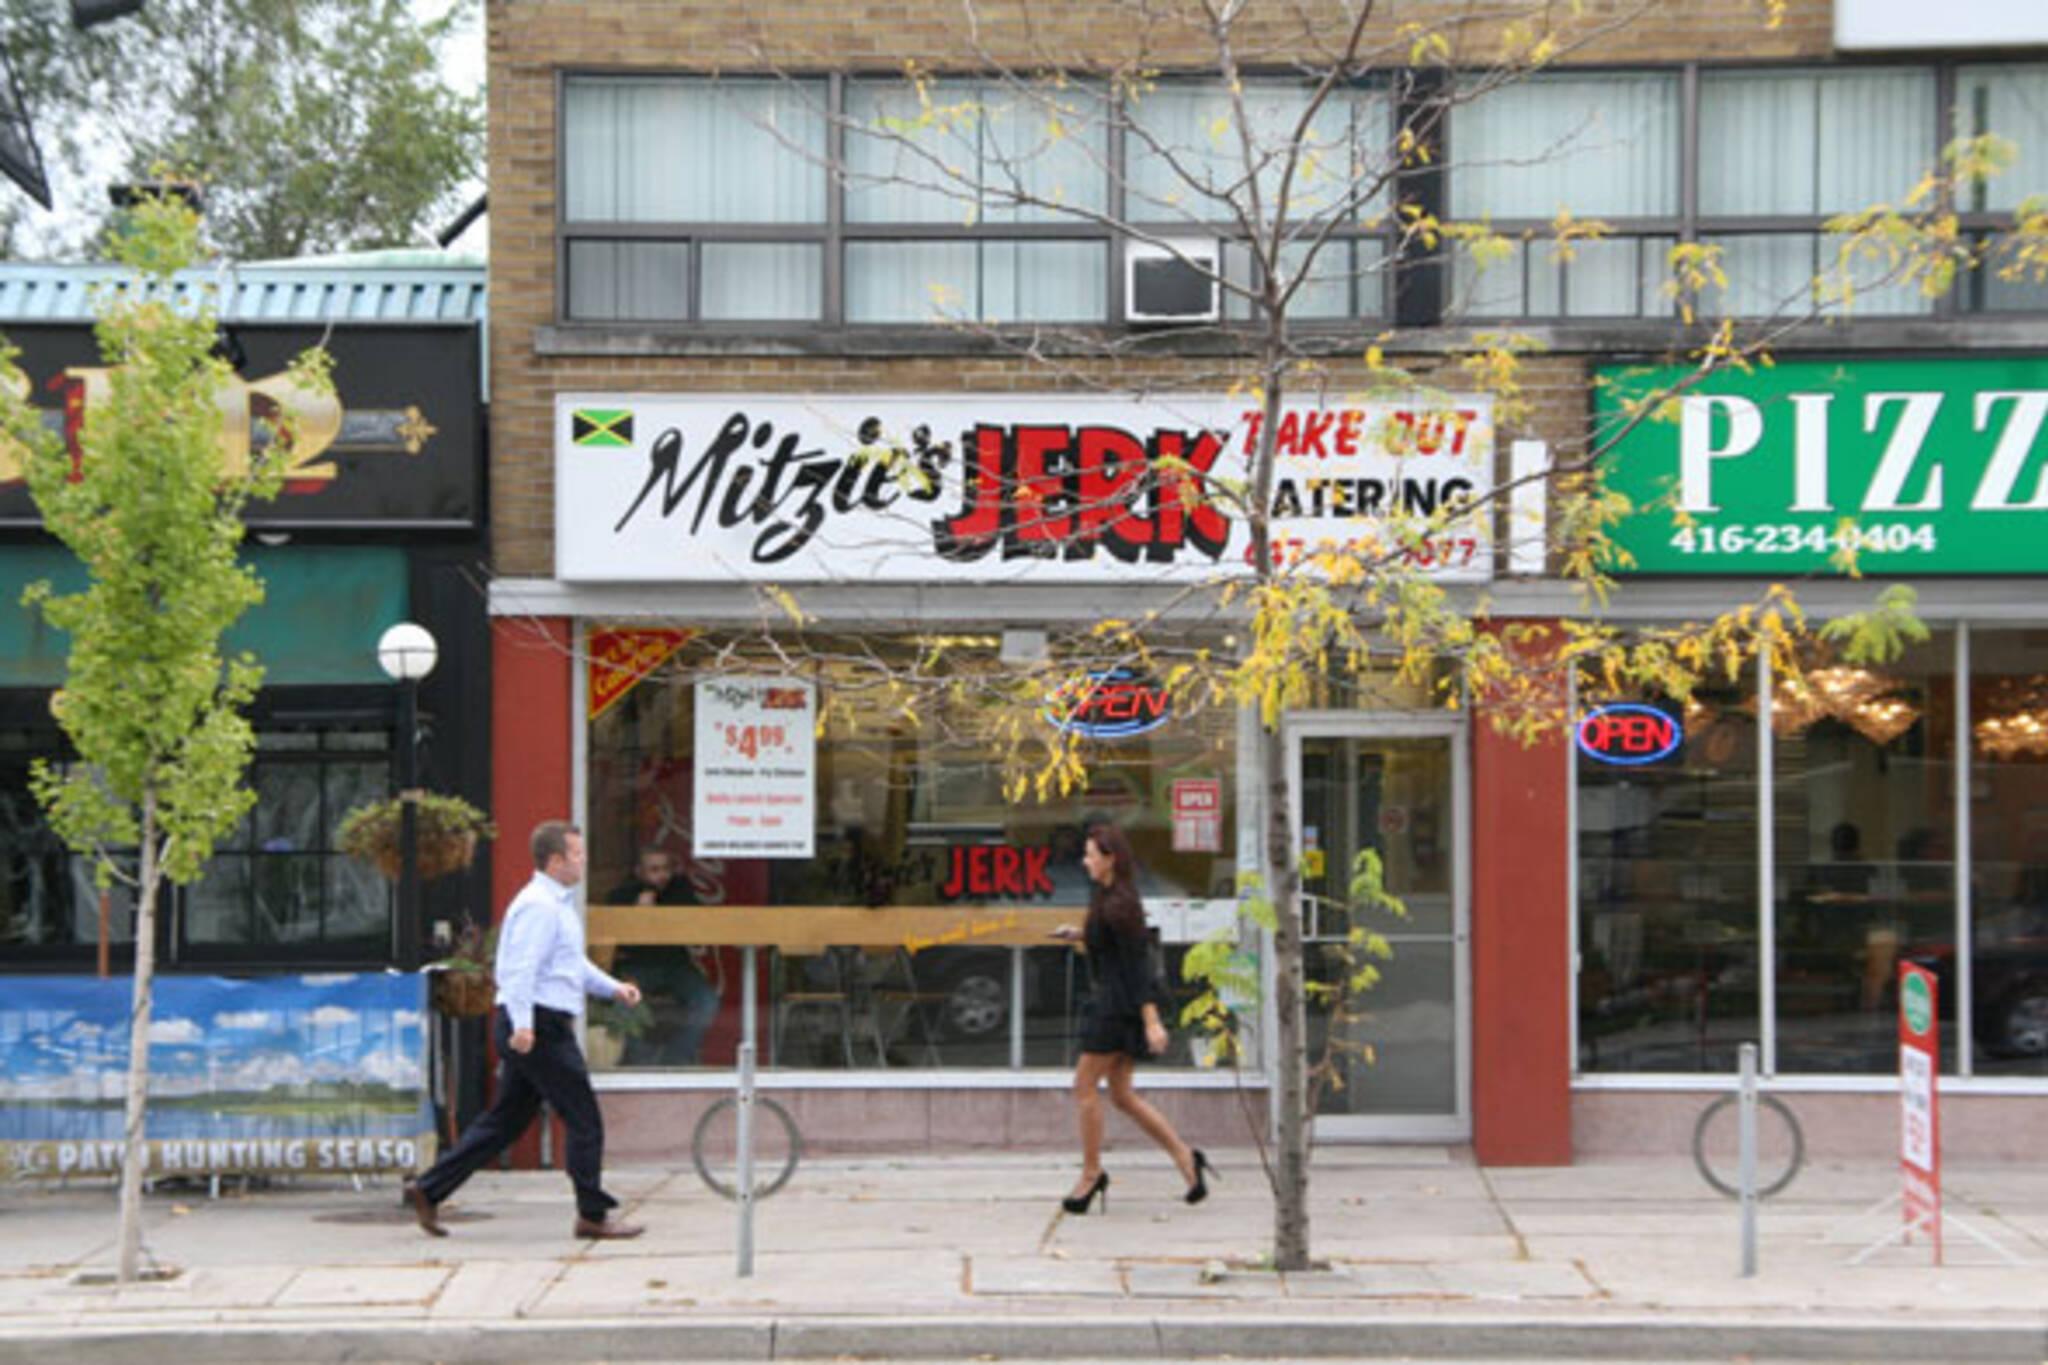 Mitzie's Jerk Toronto